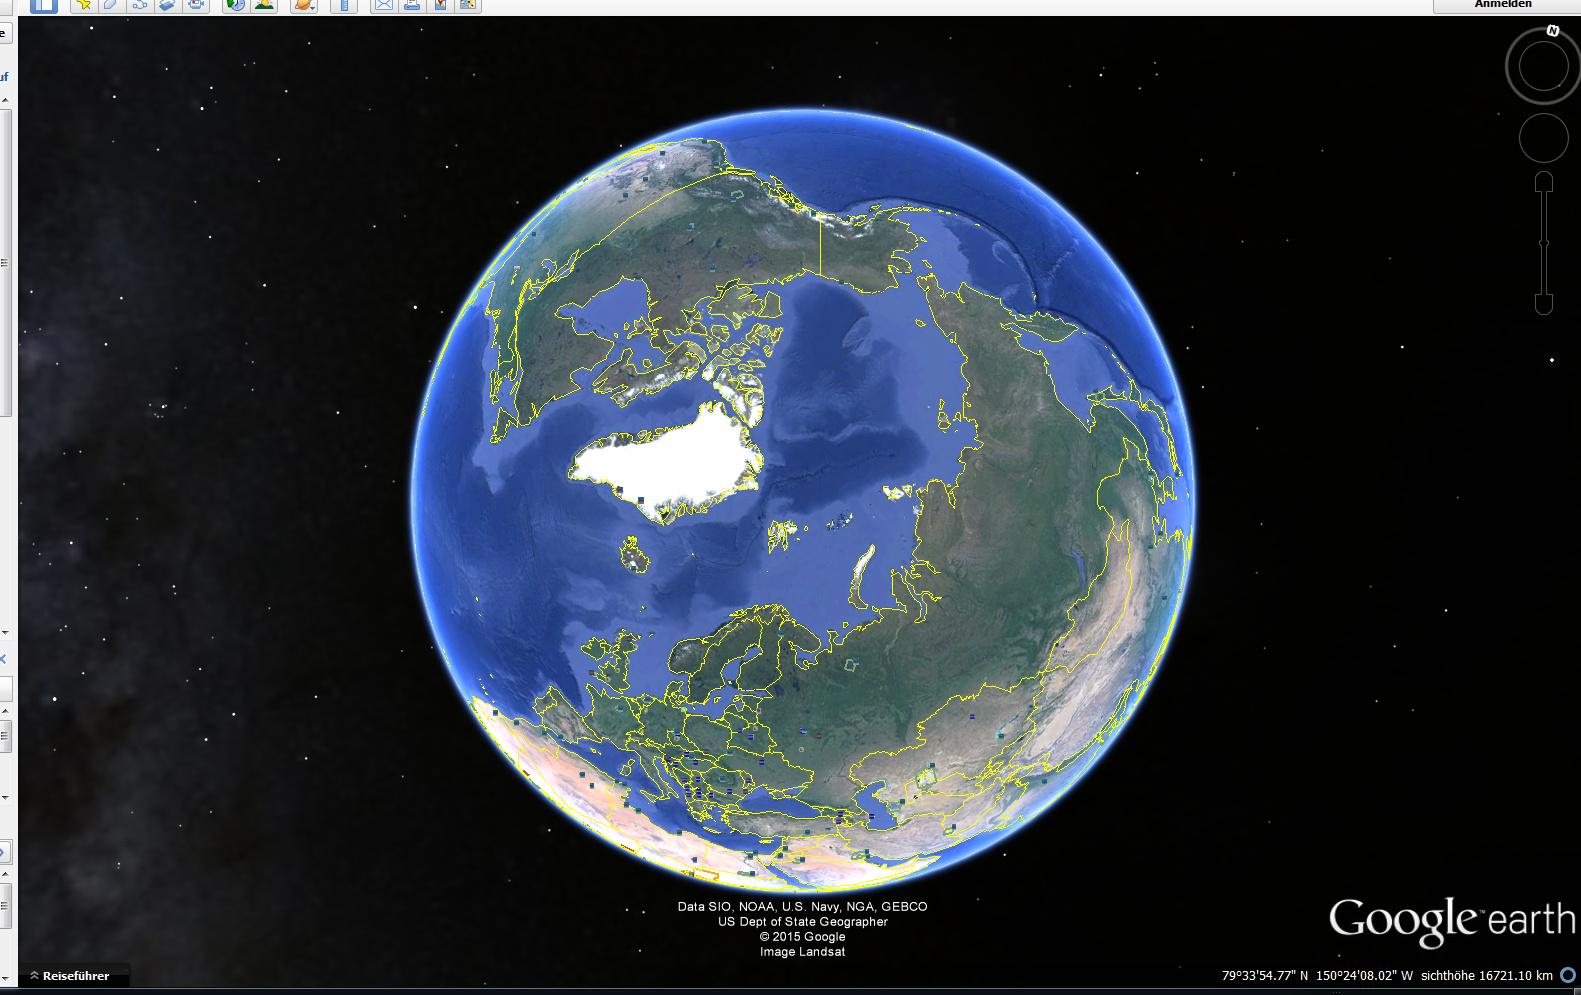 nordpol google earth nicht sichtbar. Black Bedroom Furniture Sets. Home Design Ideas